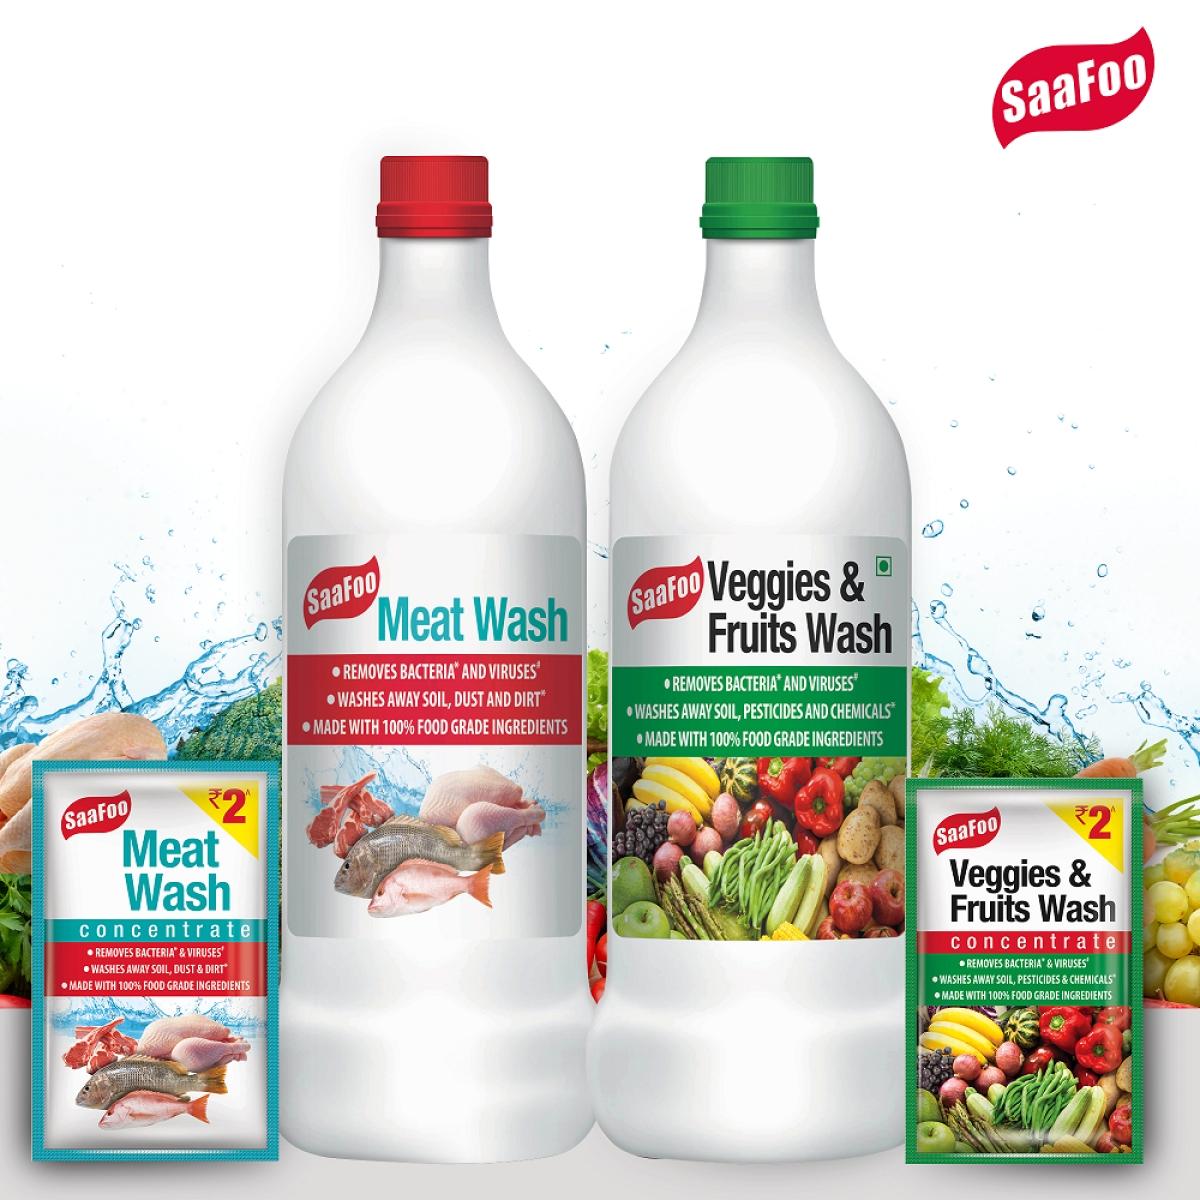 SaaFoo Meat wash and SaaFoo Veggies and Fruit Wash